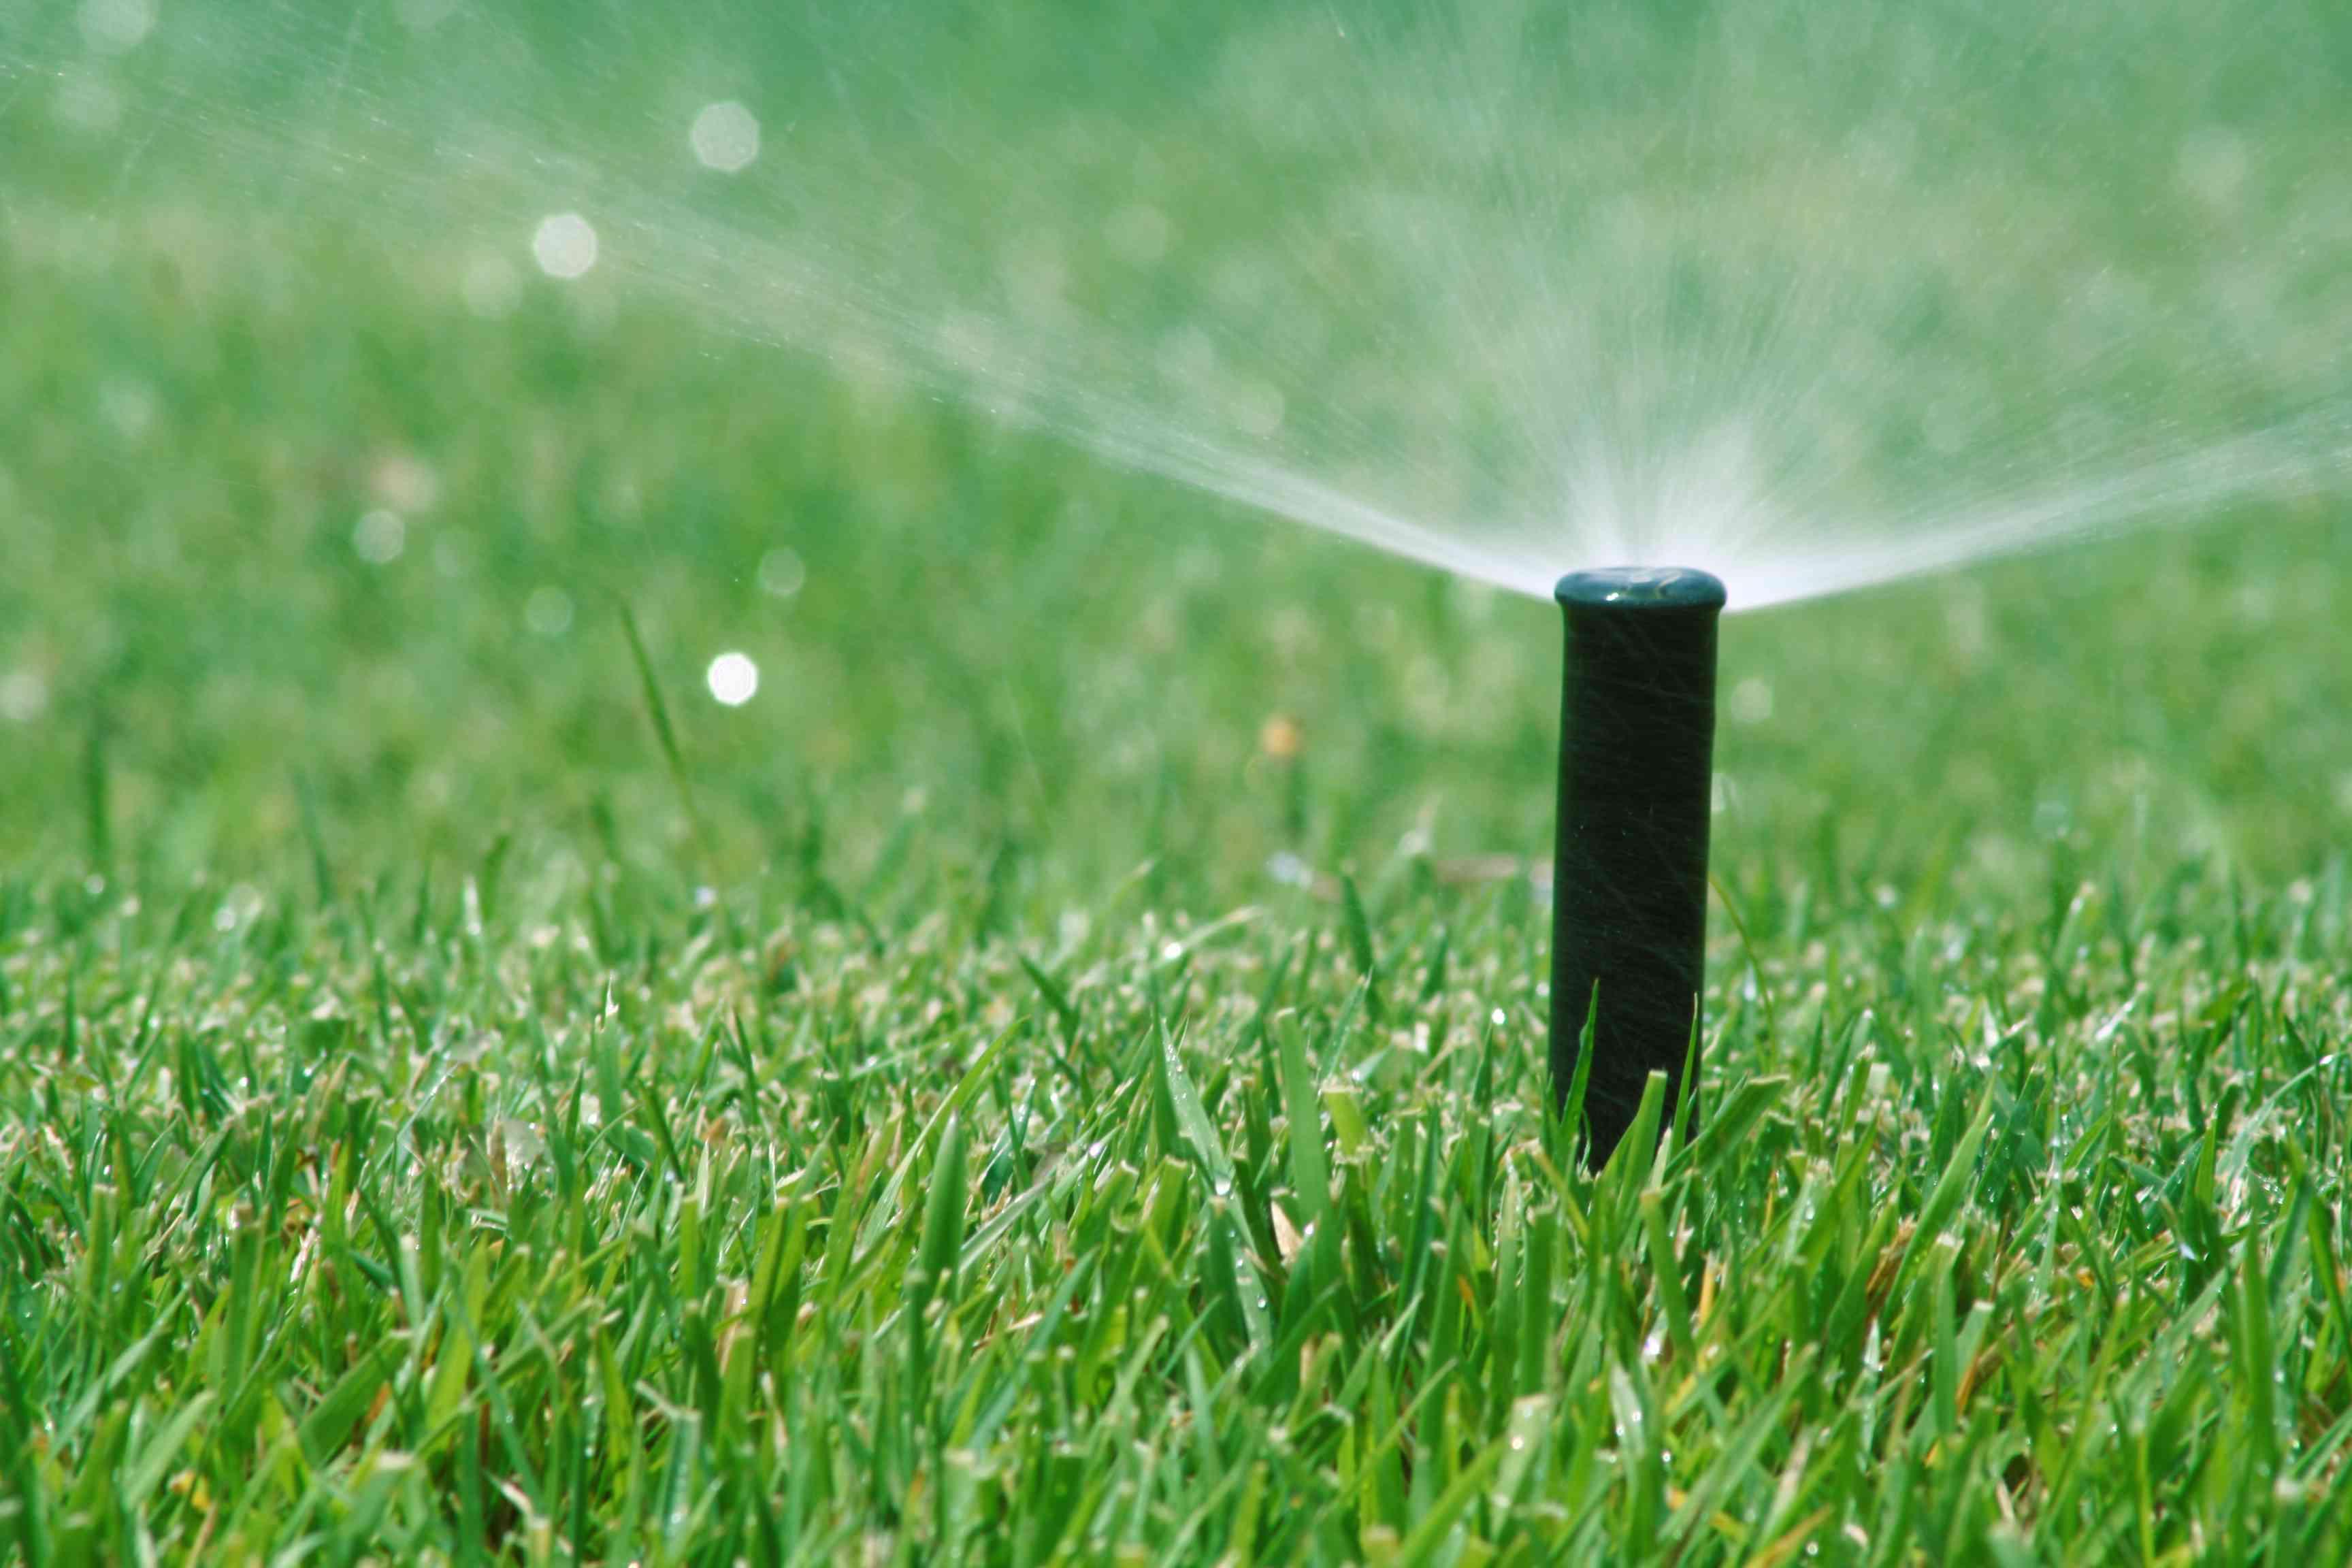 Sod needs more watering than hydroseeding